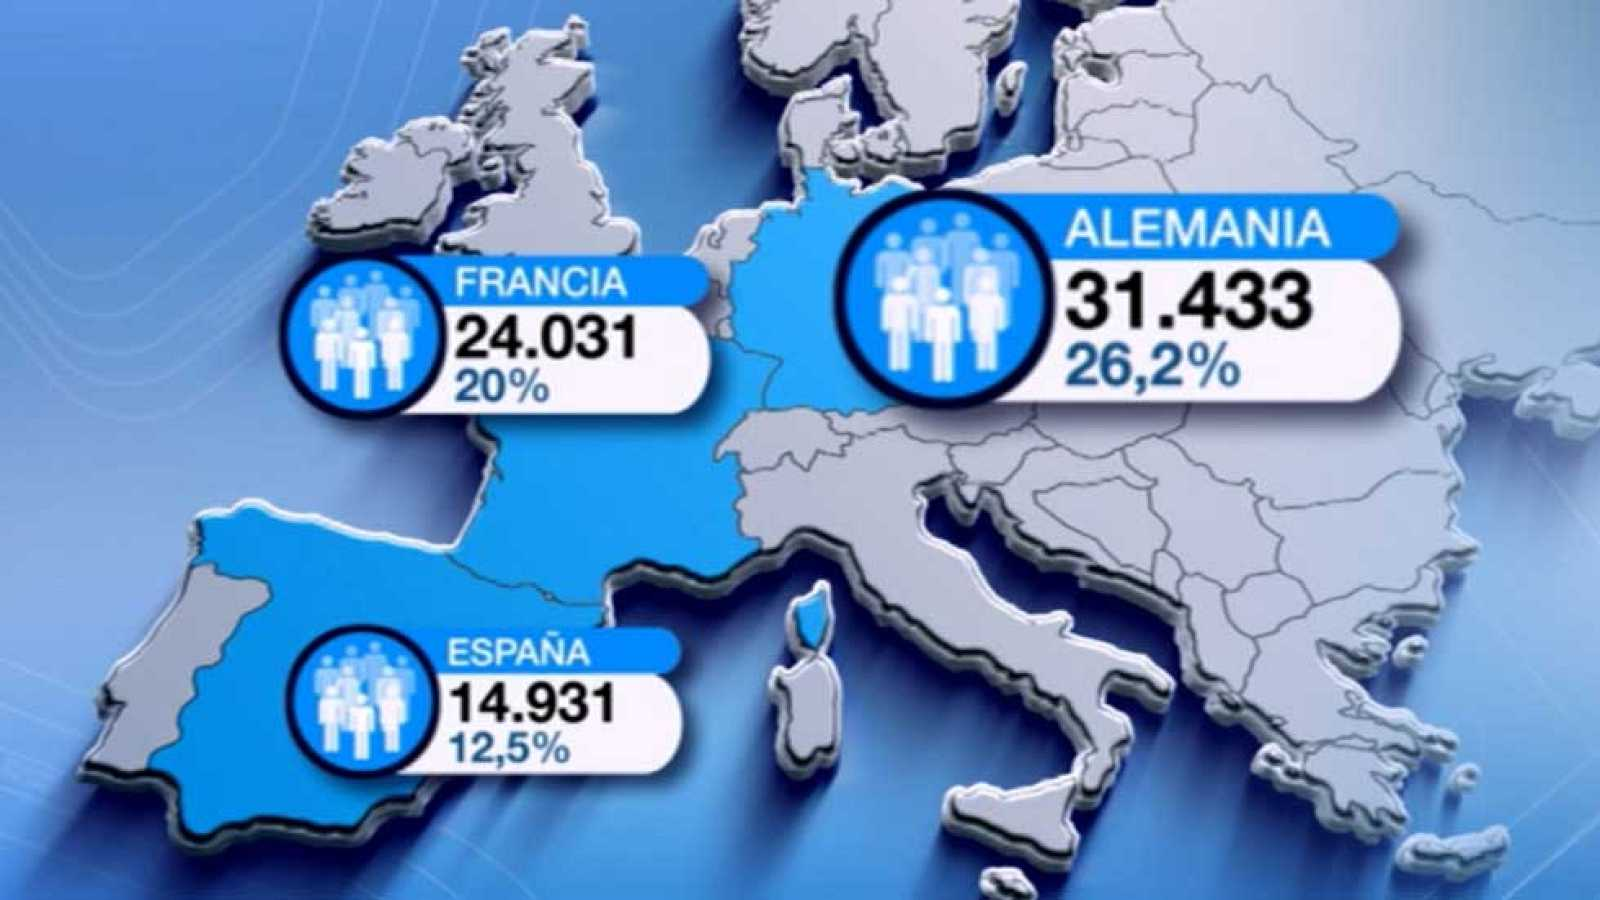 España acogerá a 14.931 refugiados del total de 120.000